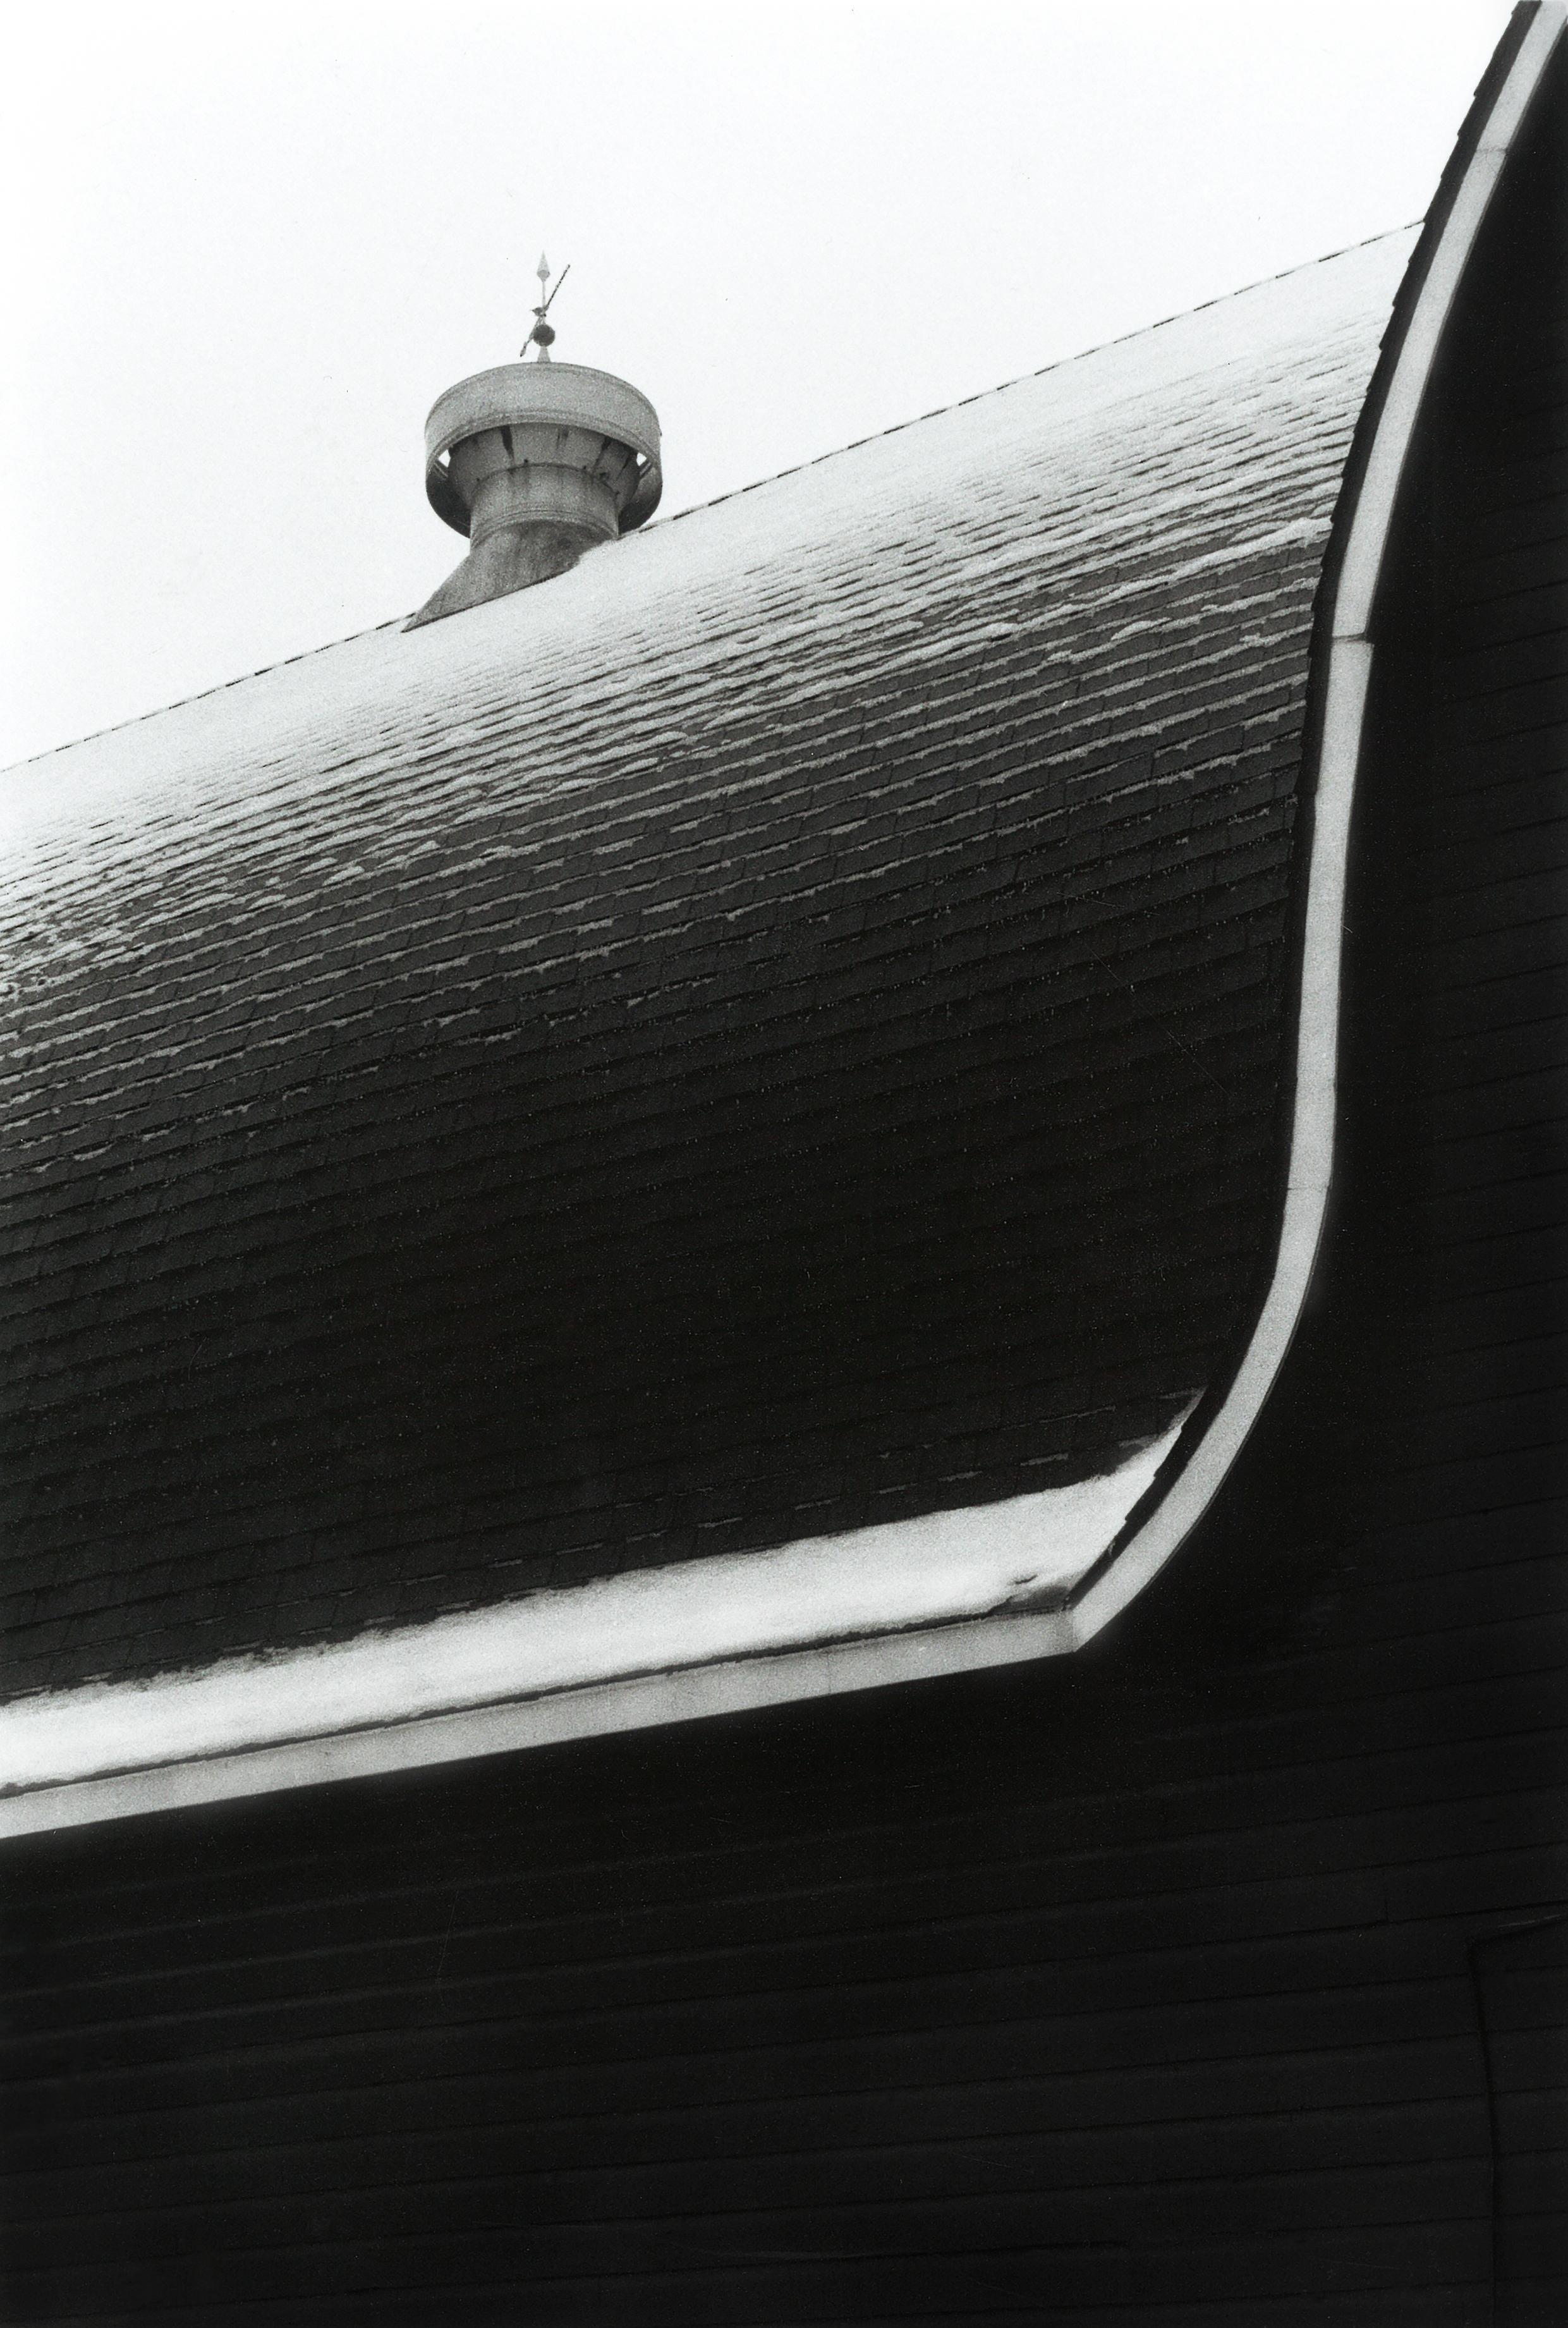 The Curved Barn .jpg